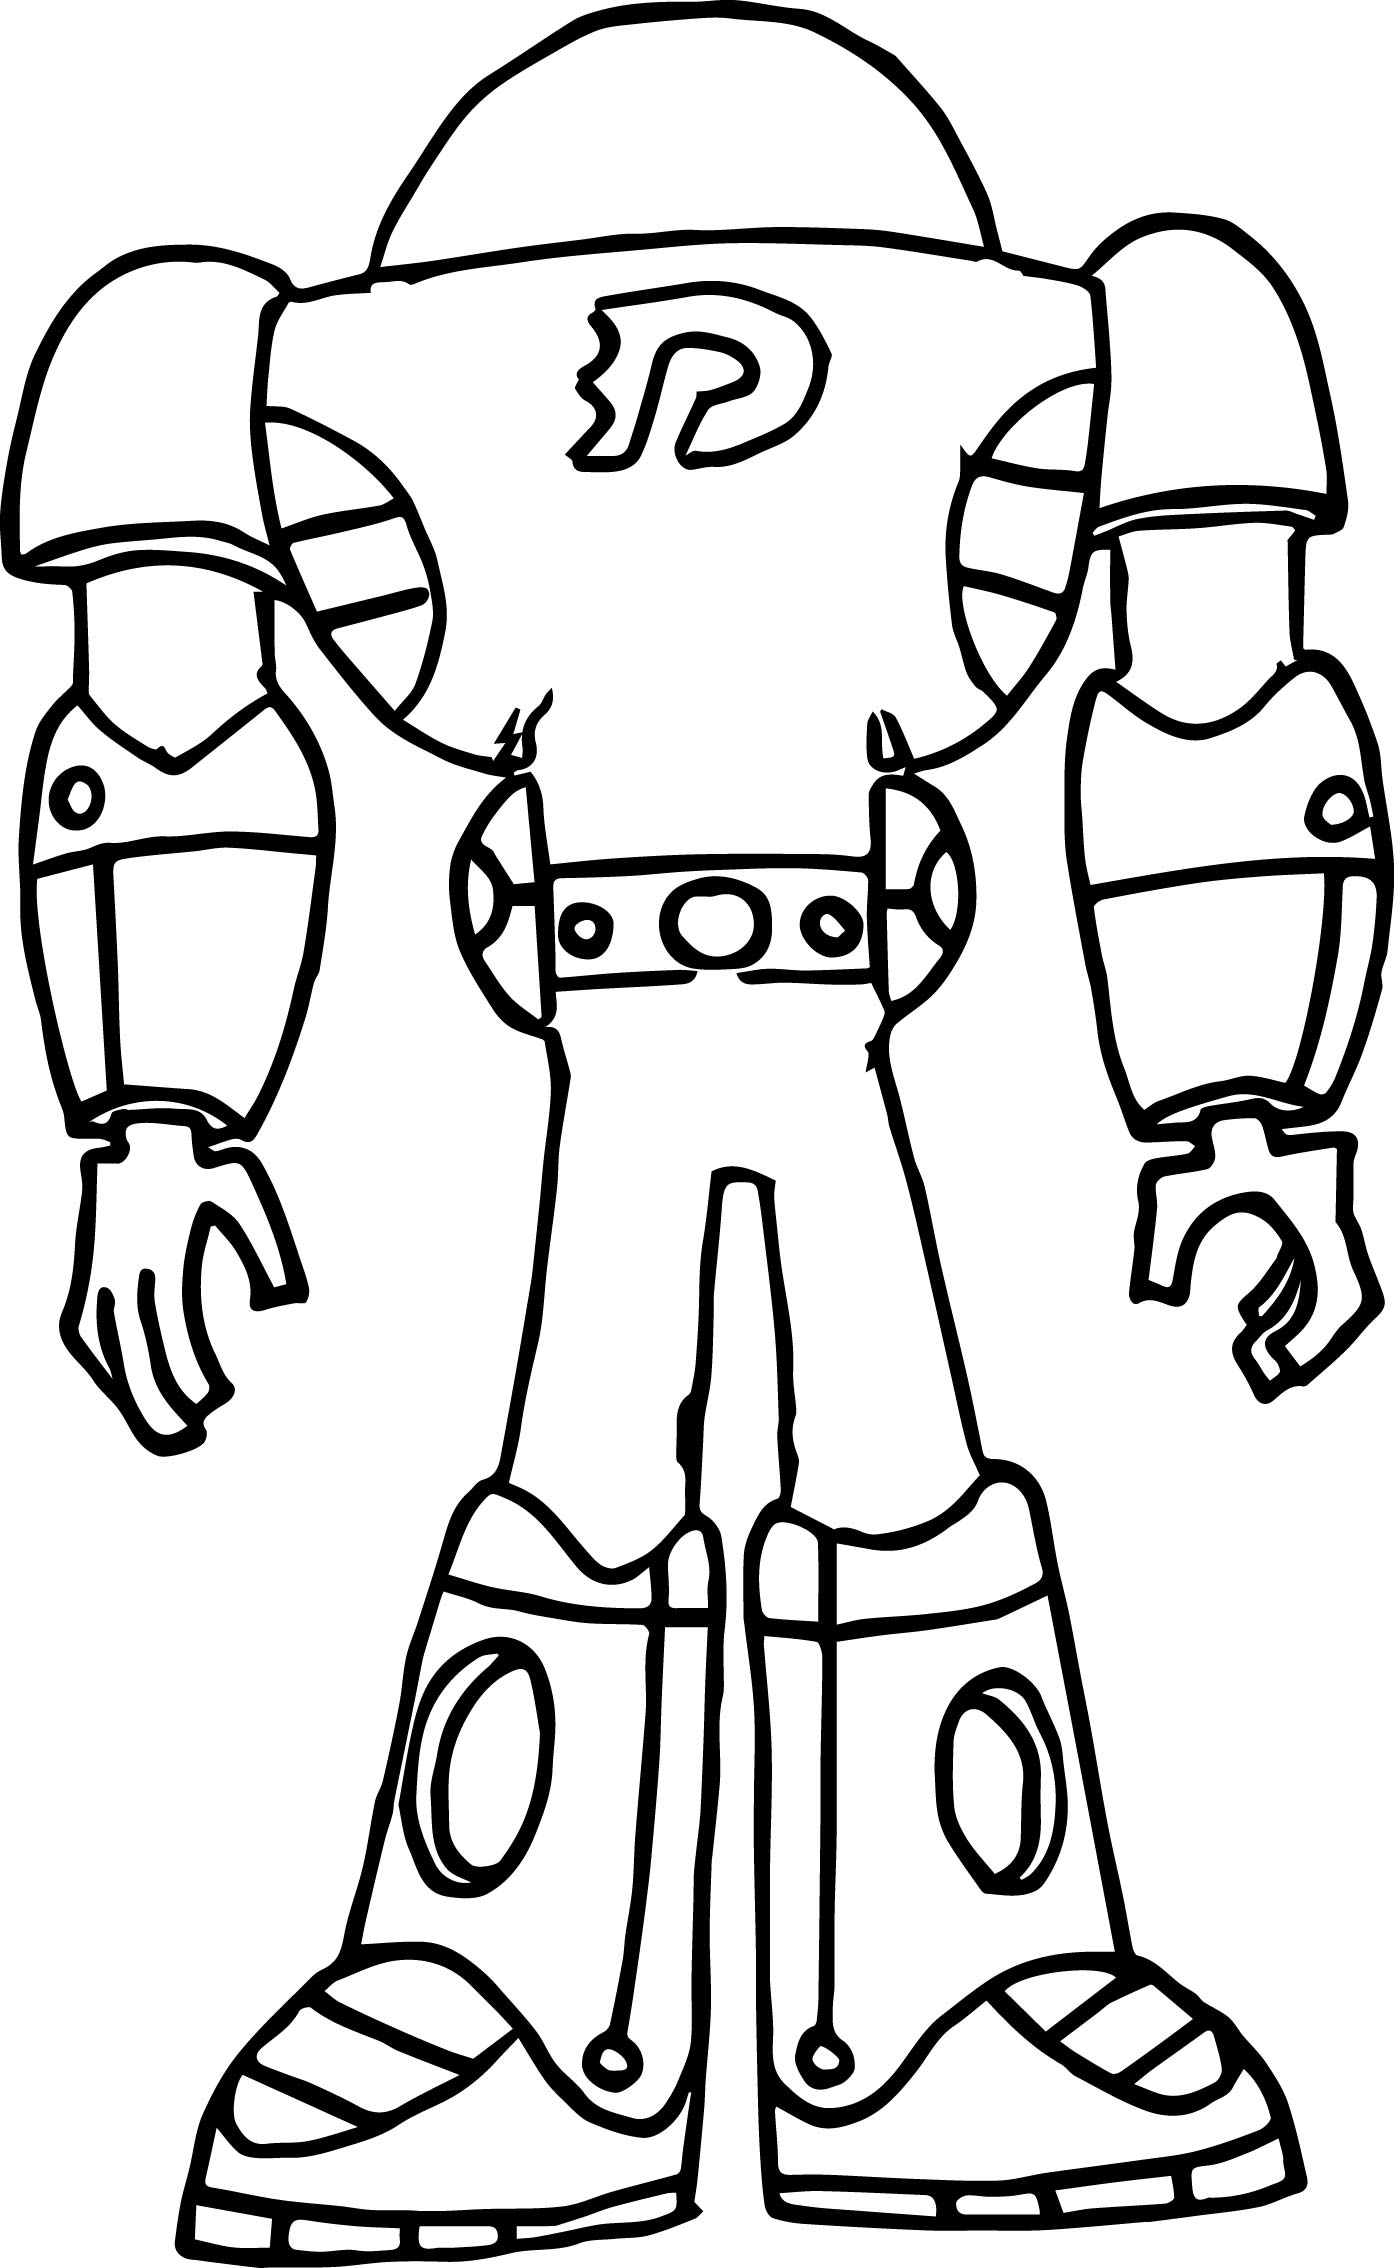 Danny Phantom S Ecto Skeleton Coloring Page Wecoloringpage Danny Phantom Coloring Pages